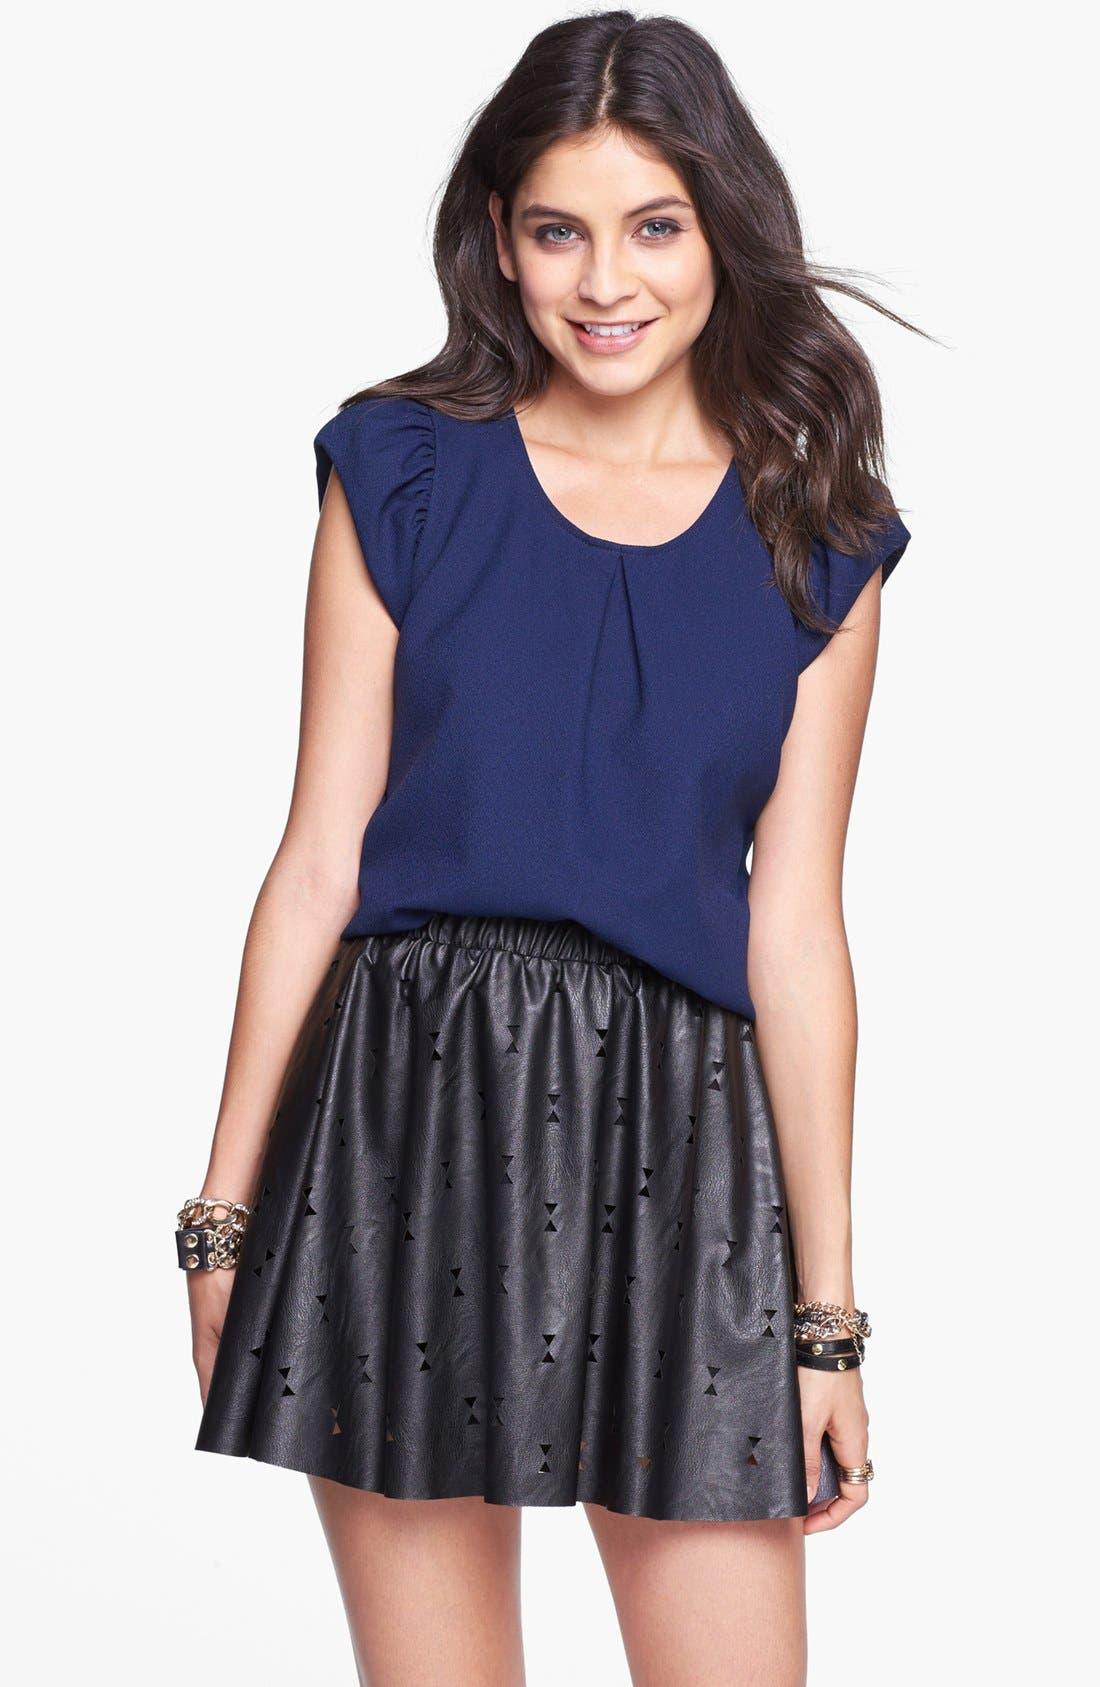 Alternate Image 1 Selected - Blu Pepper Laser Cut Faux Leather Skater Skirt (Juniors)